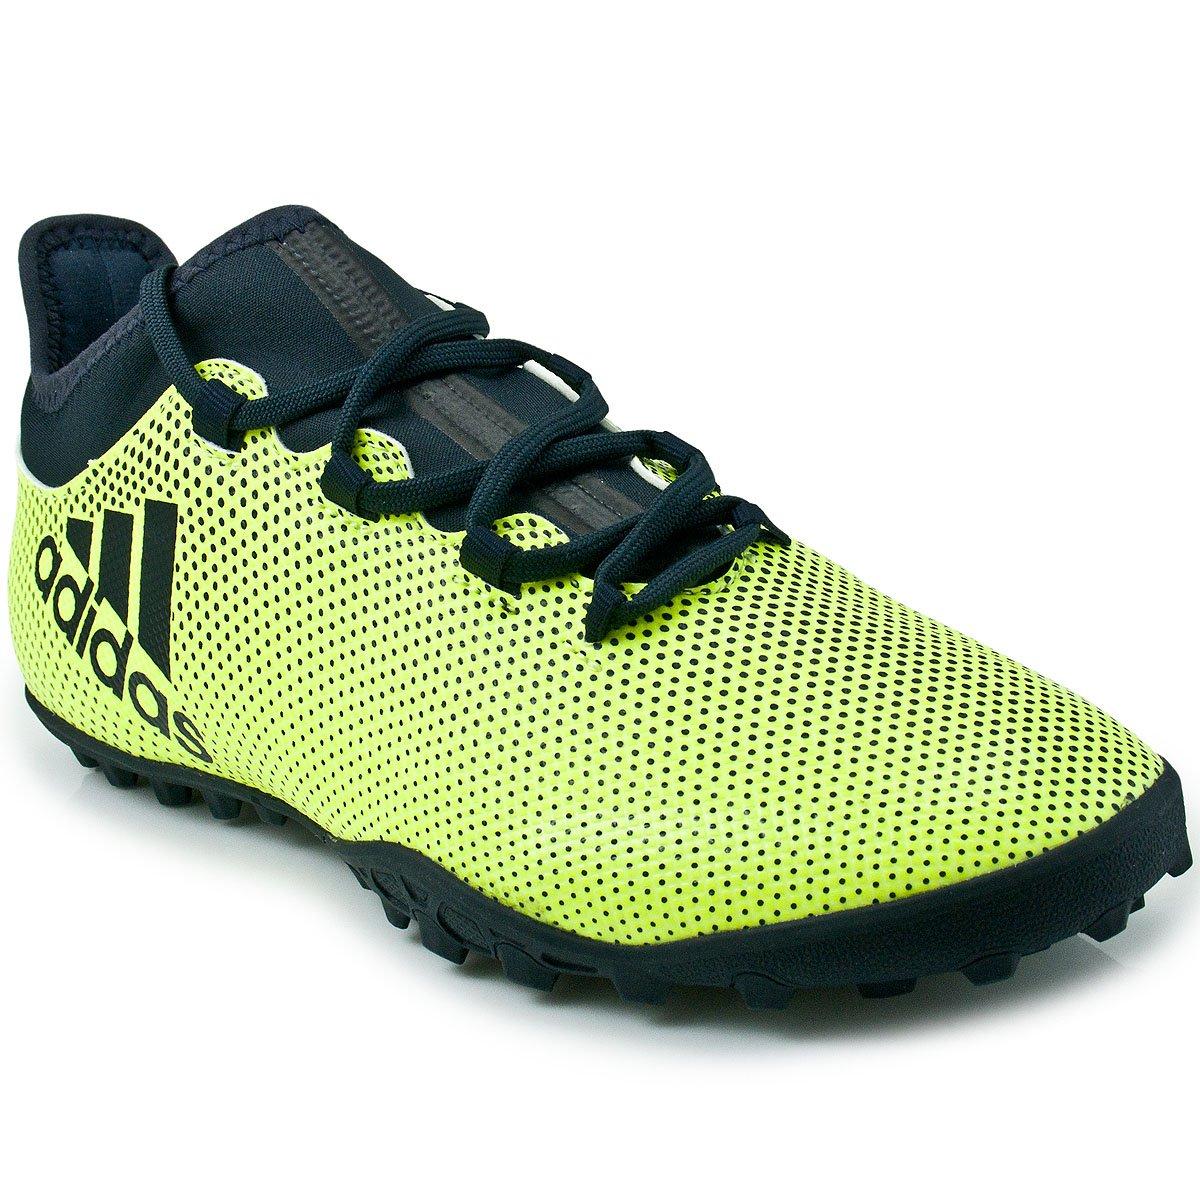 Chuteira Adidas X 17.3 TF  e6952f1fd55c9